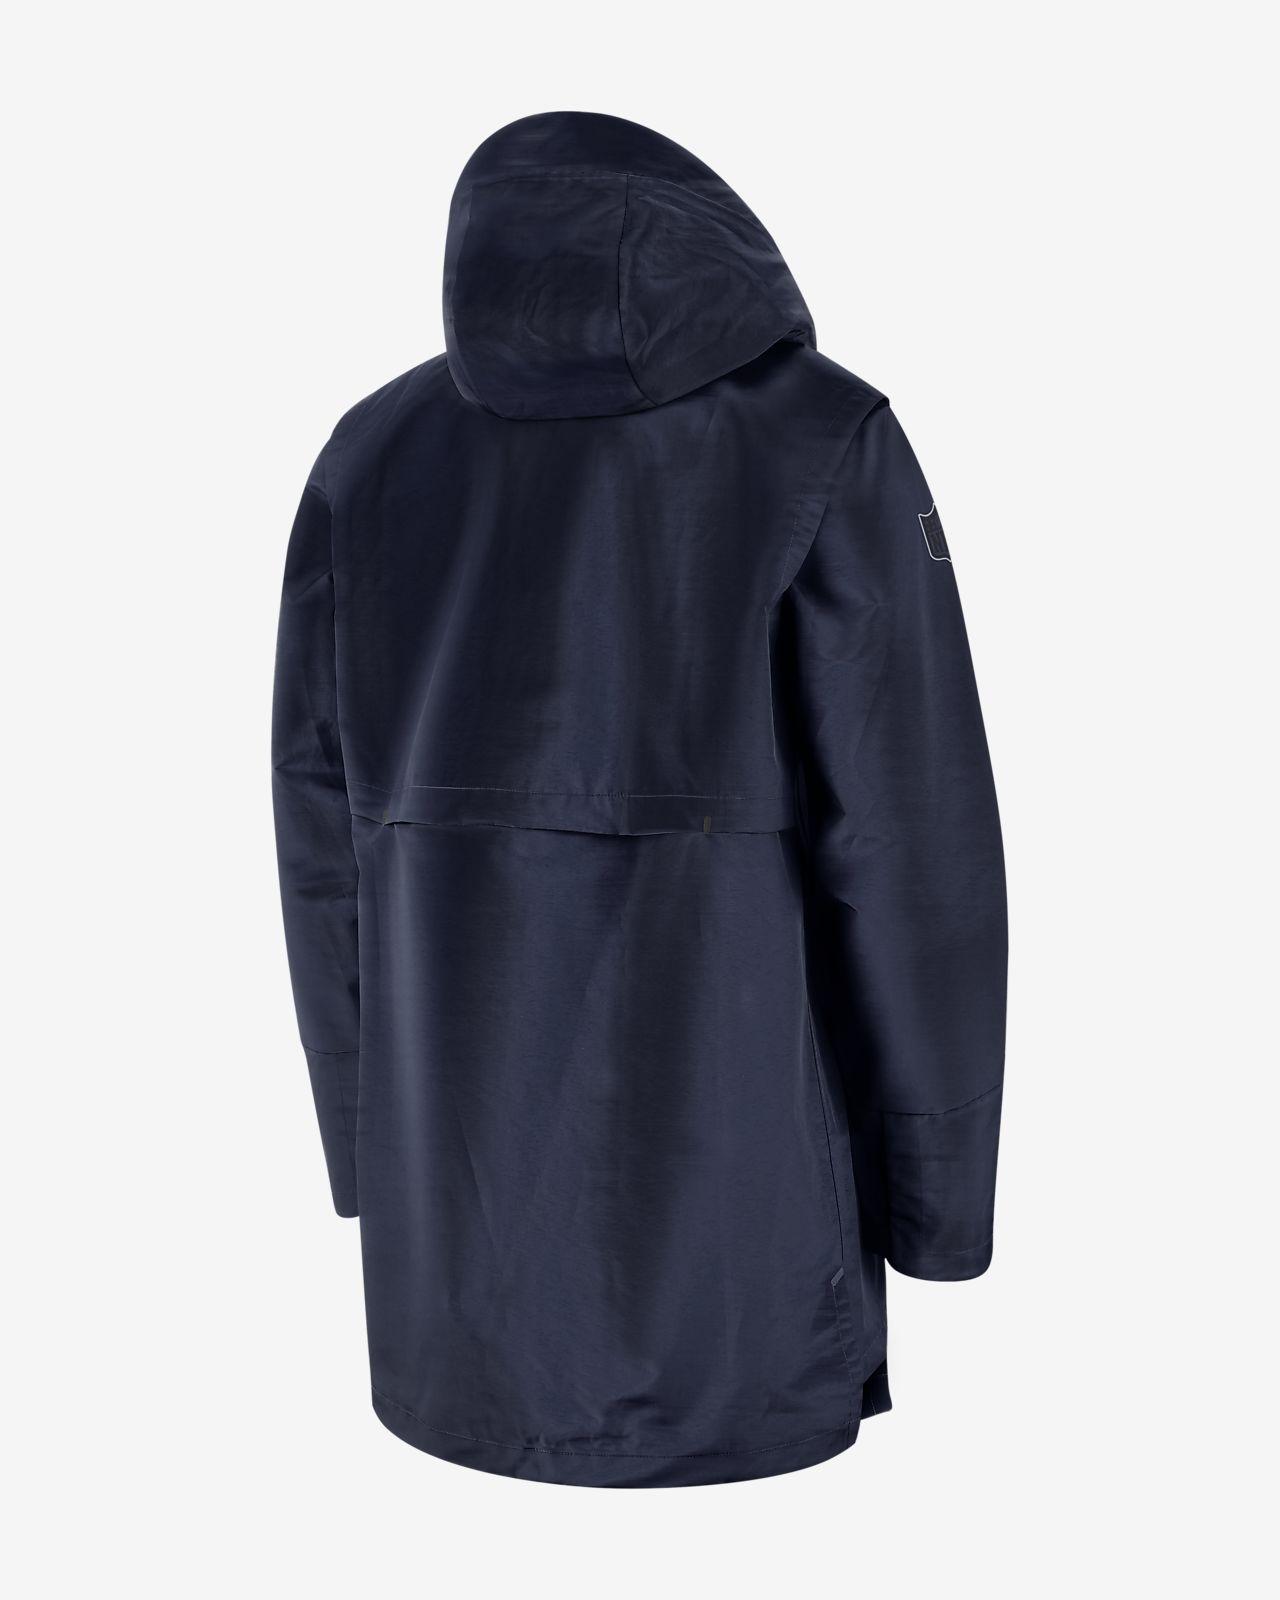 a0eee9733021 Nike Sideline (NFL Cowboys) Men s Jacket. Nike.com